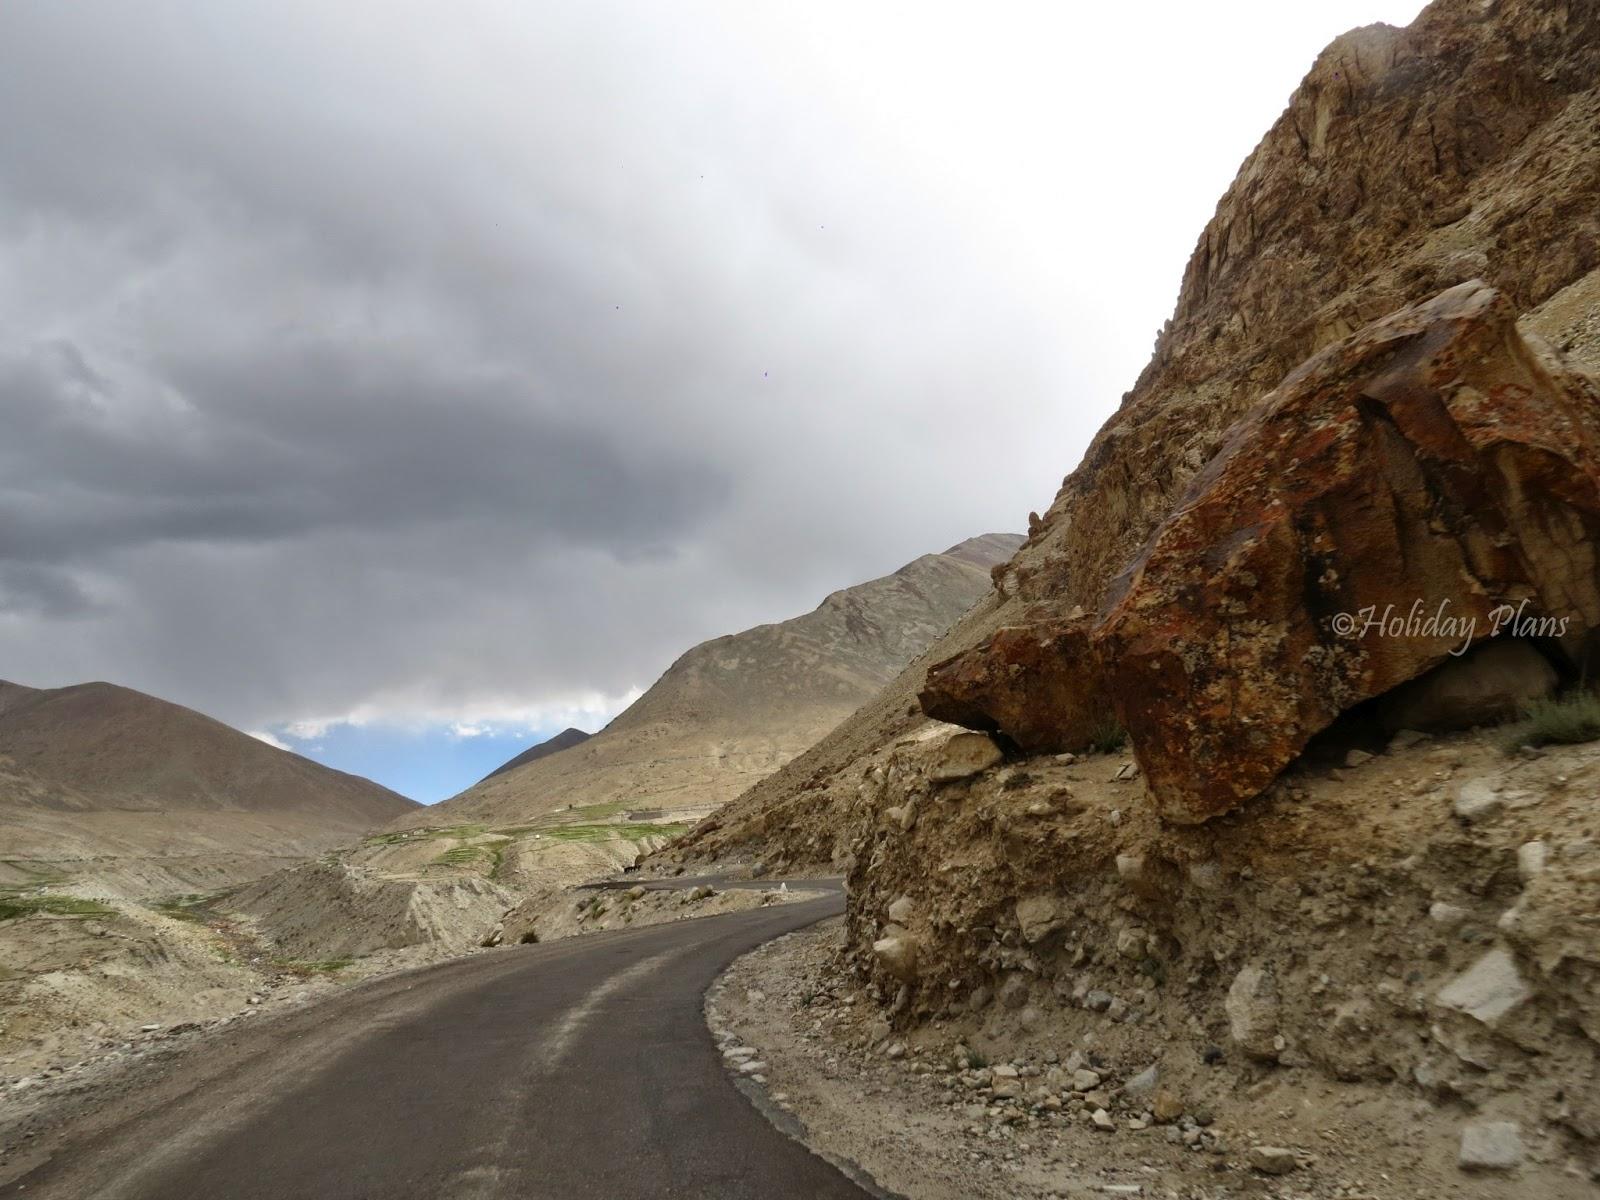 The adventurous route